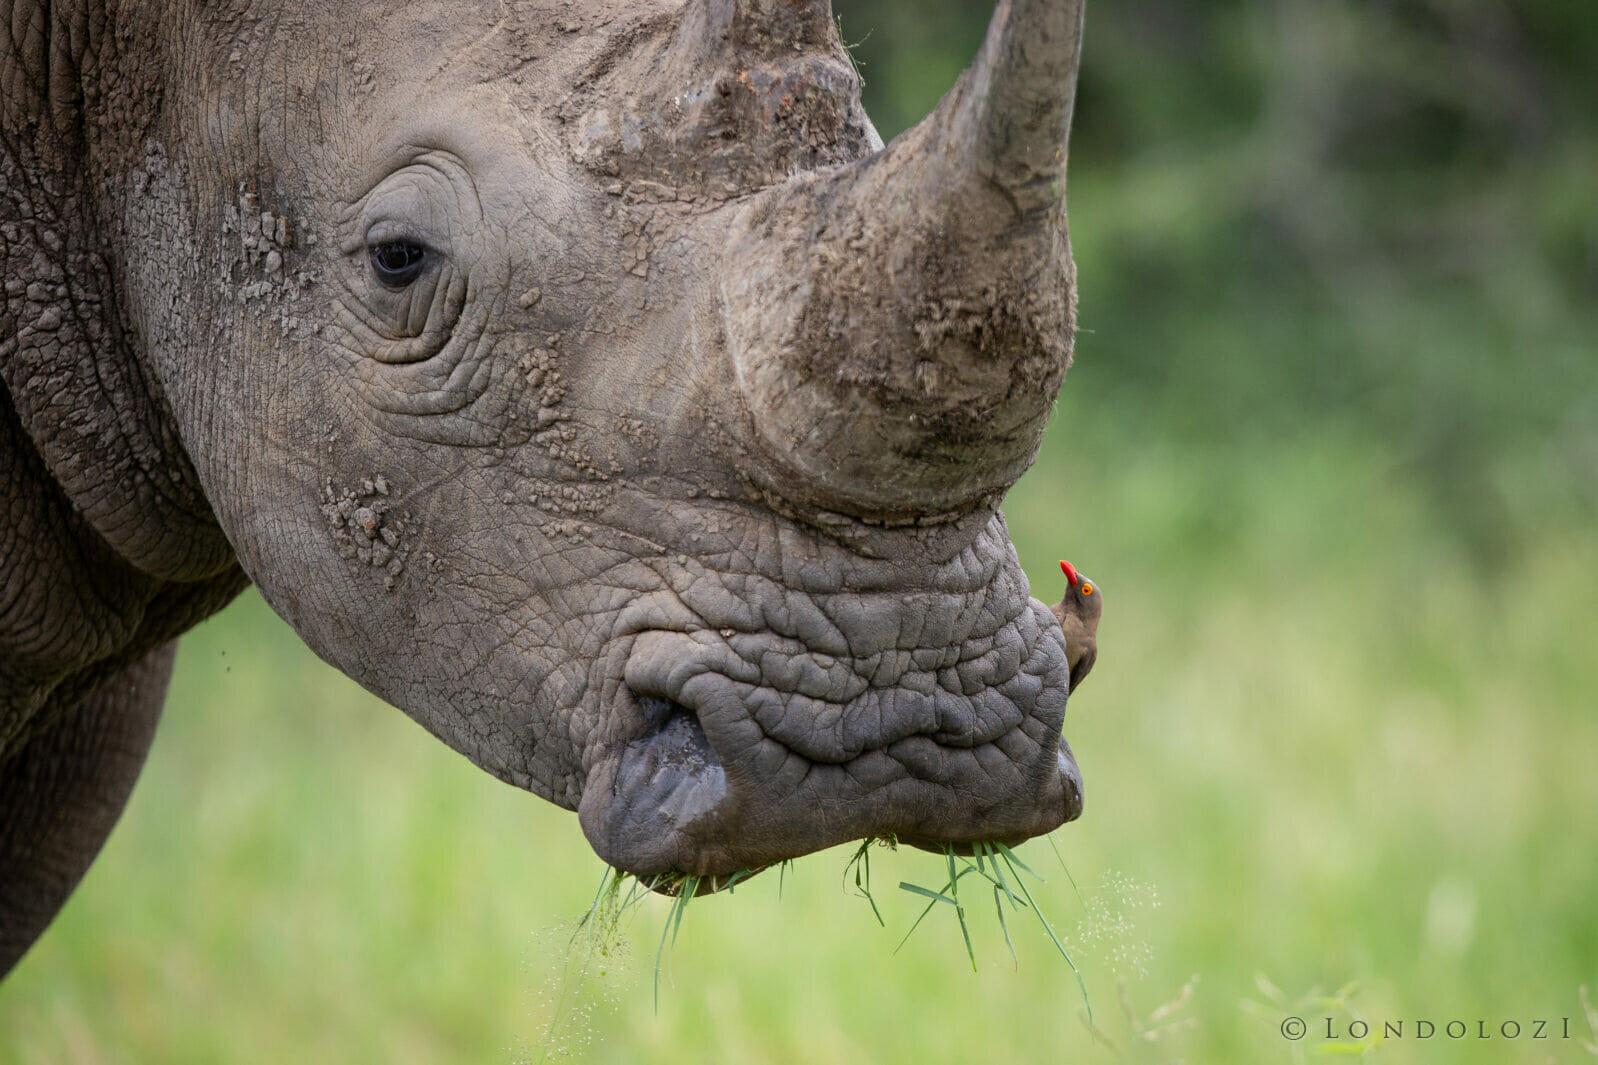 Rhino Lip Lfa611761